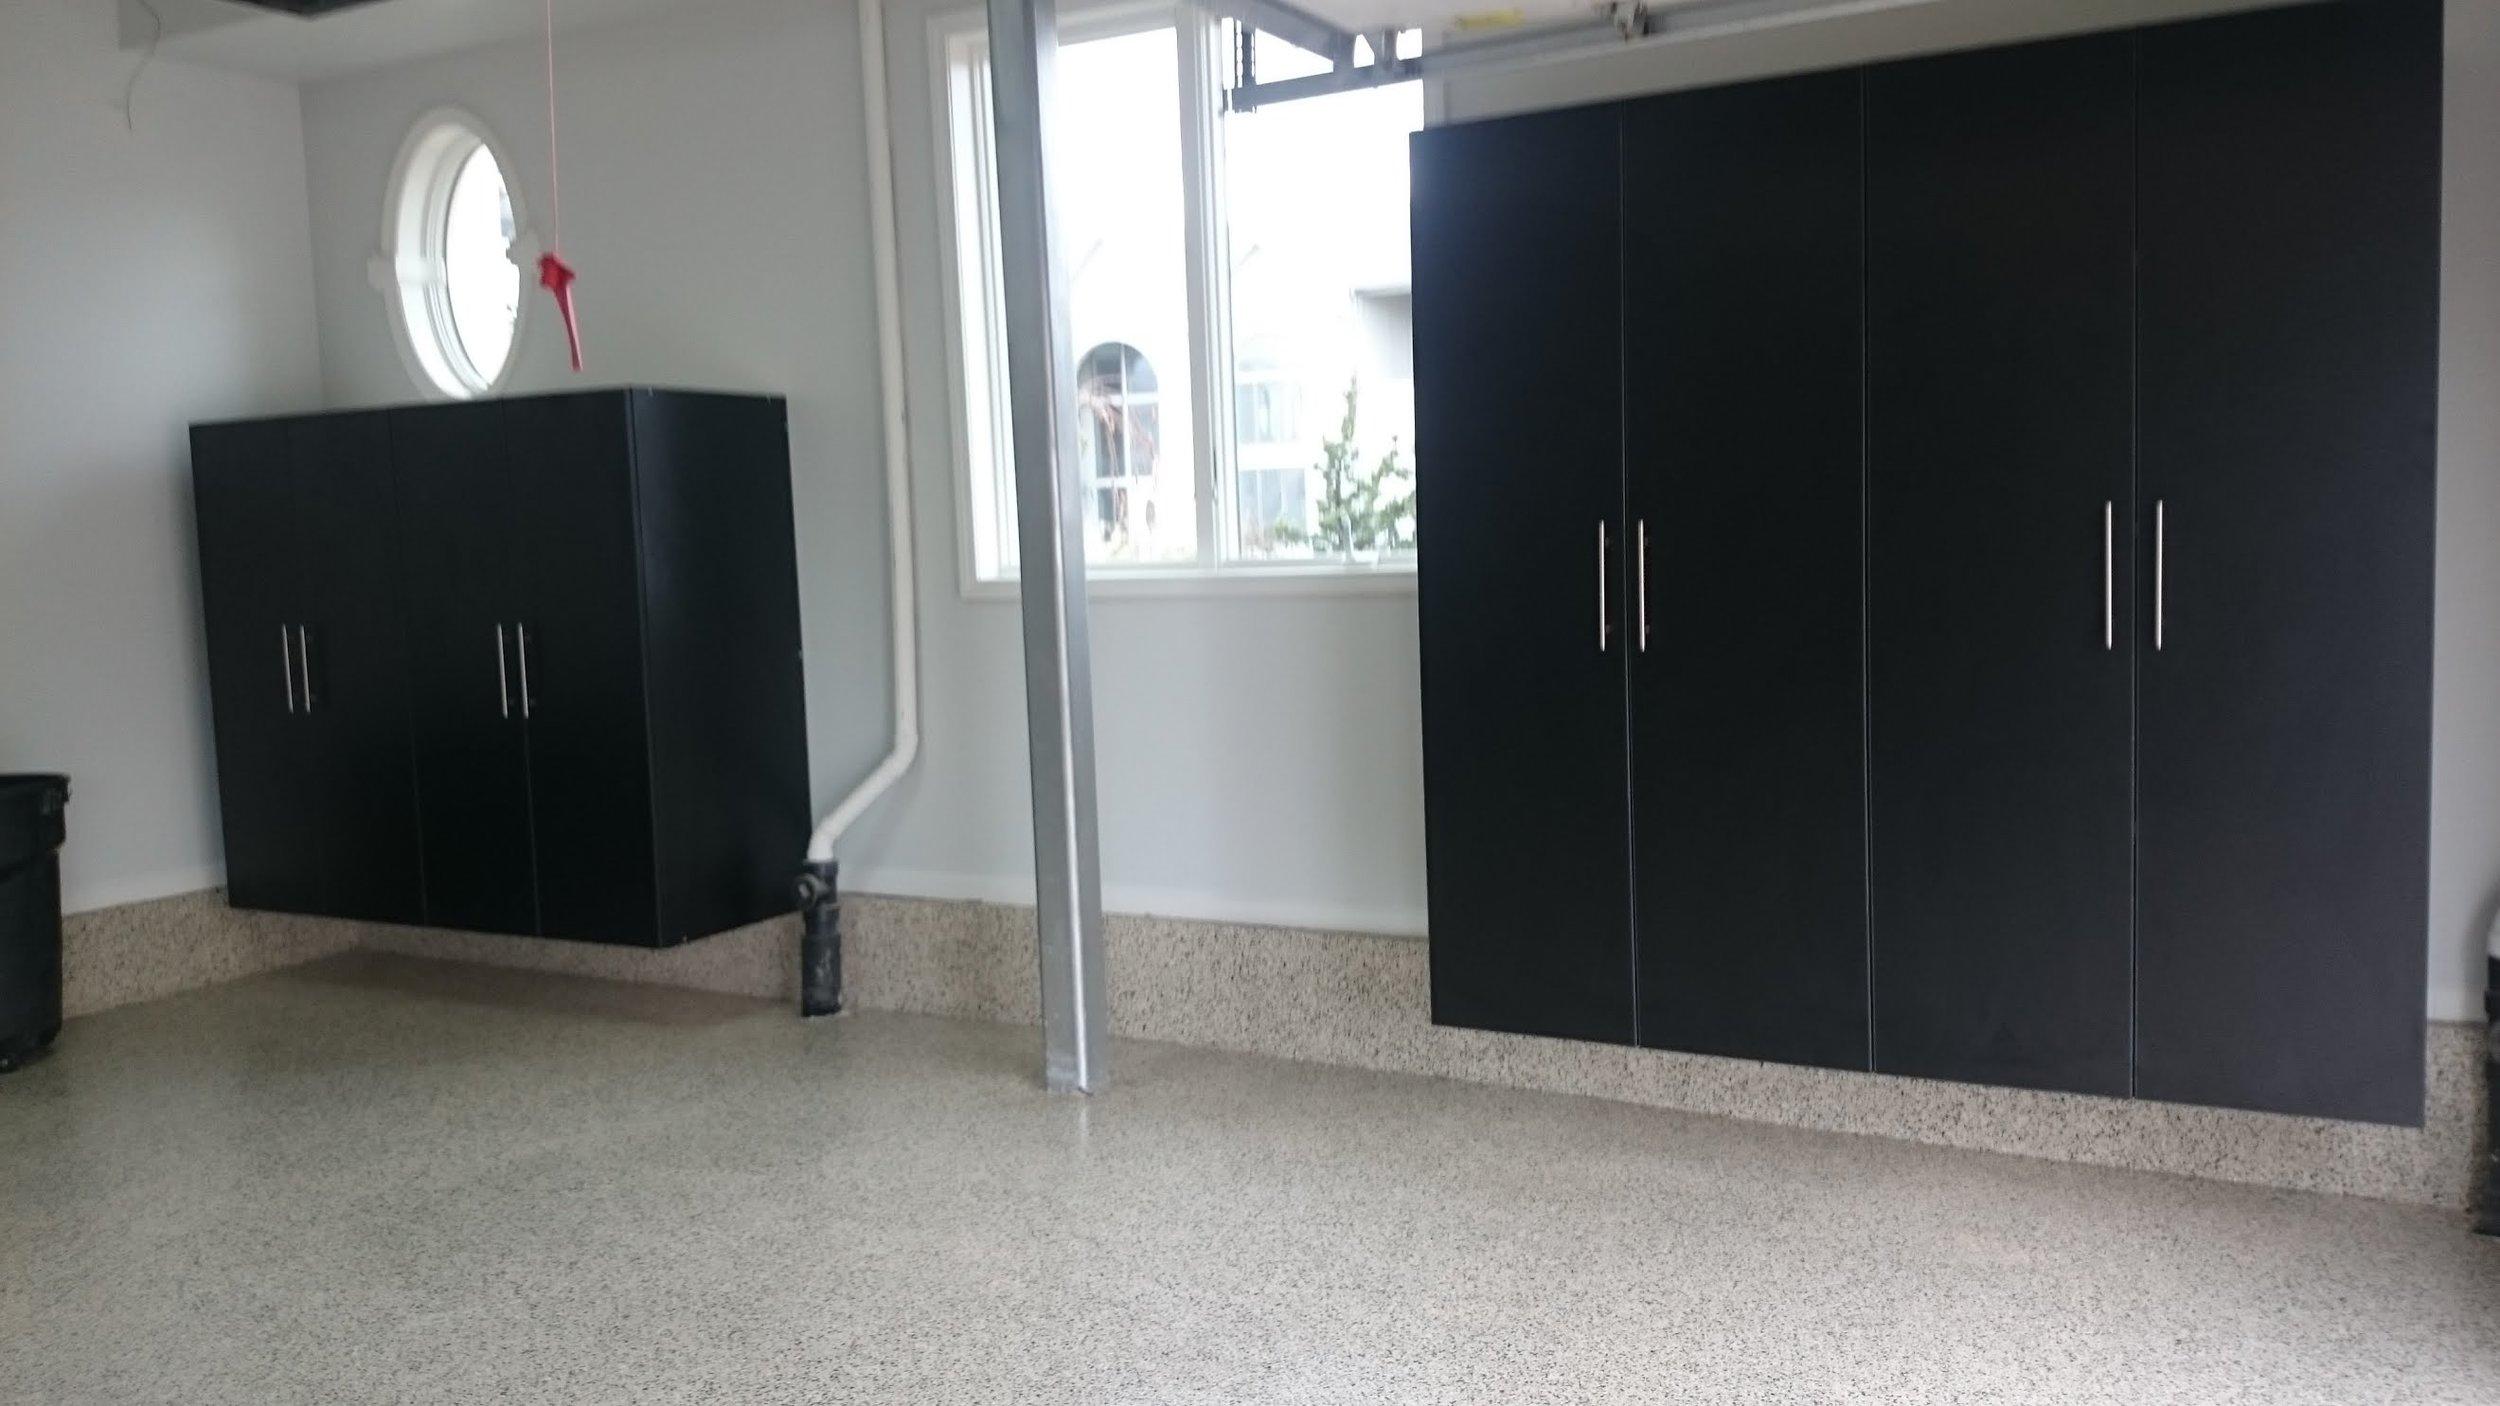 Garage concrete floor with polyurea / POLYASPARTIC coating with garage storage cabinets example